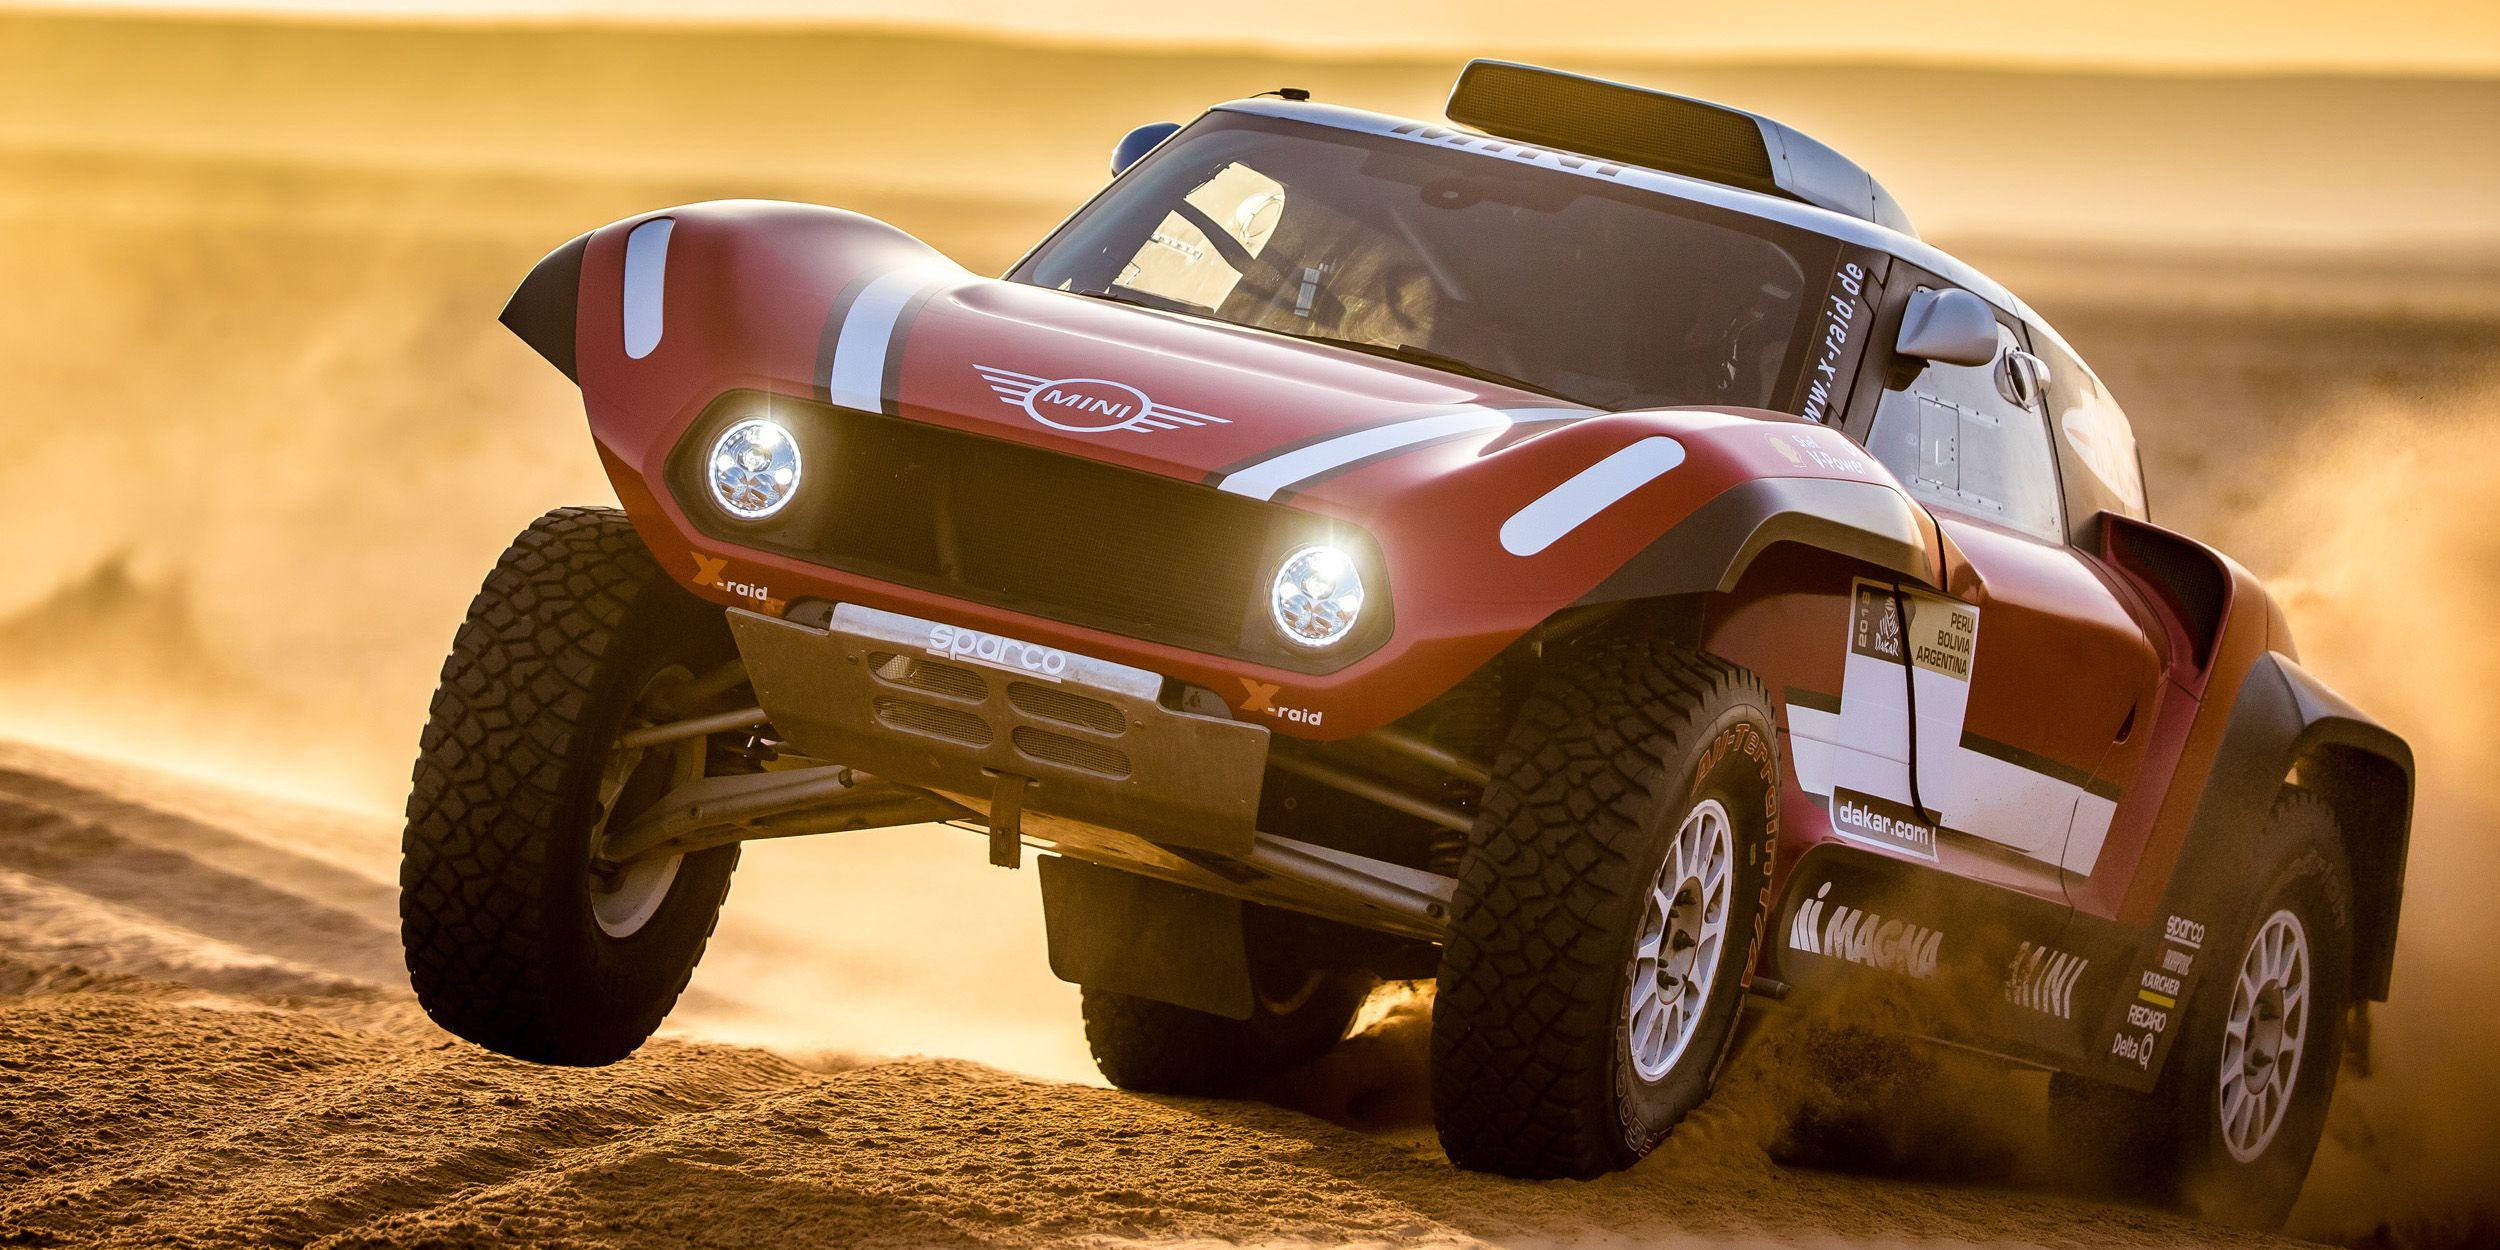 Mini's Dakar Dune Buggy Looks Like Endless Fun